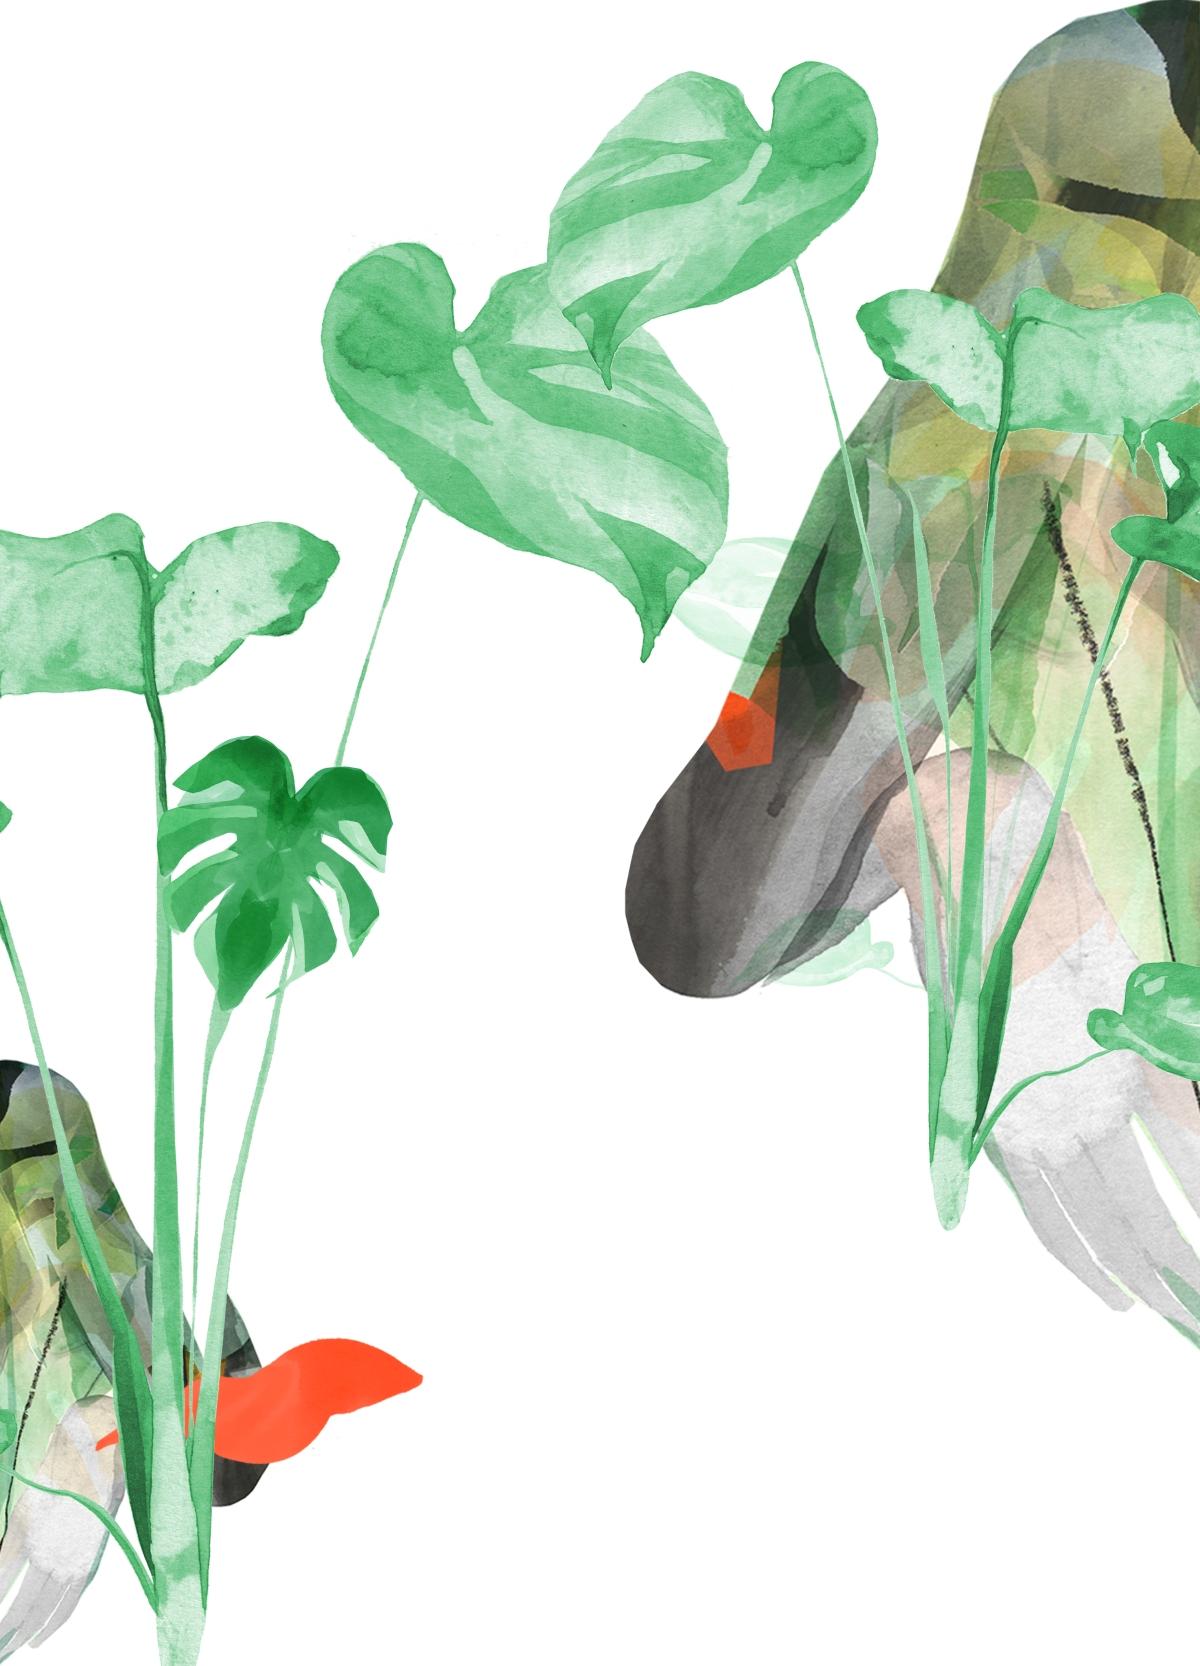 joannalayla_greenfingers_designforalyusha_2